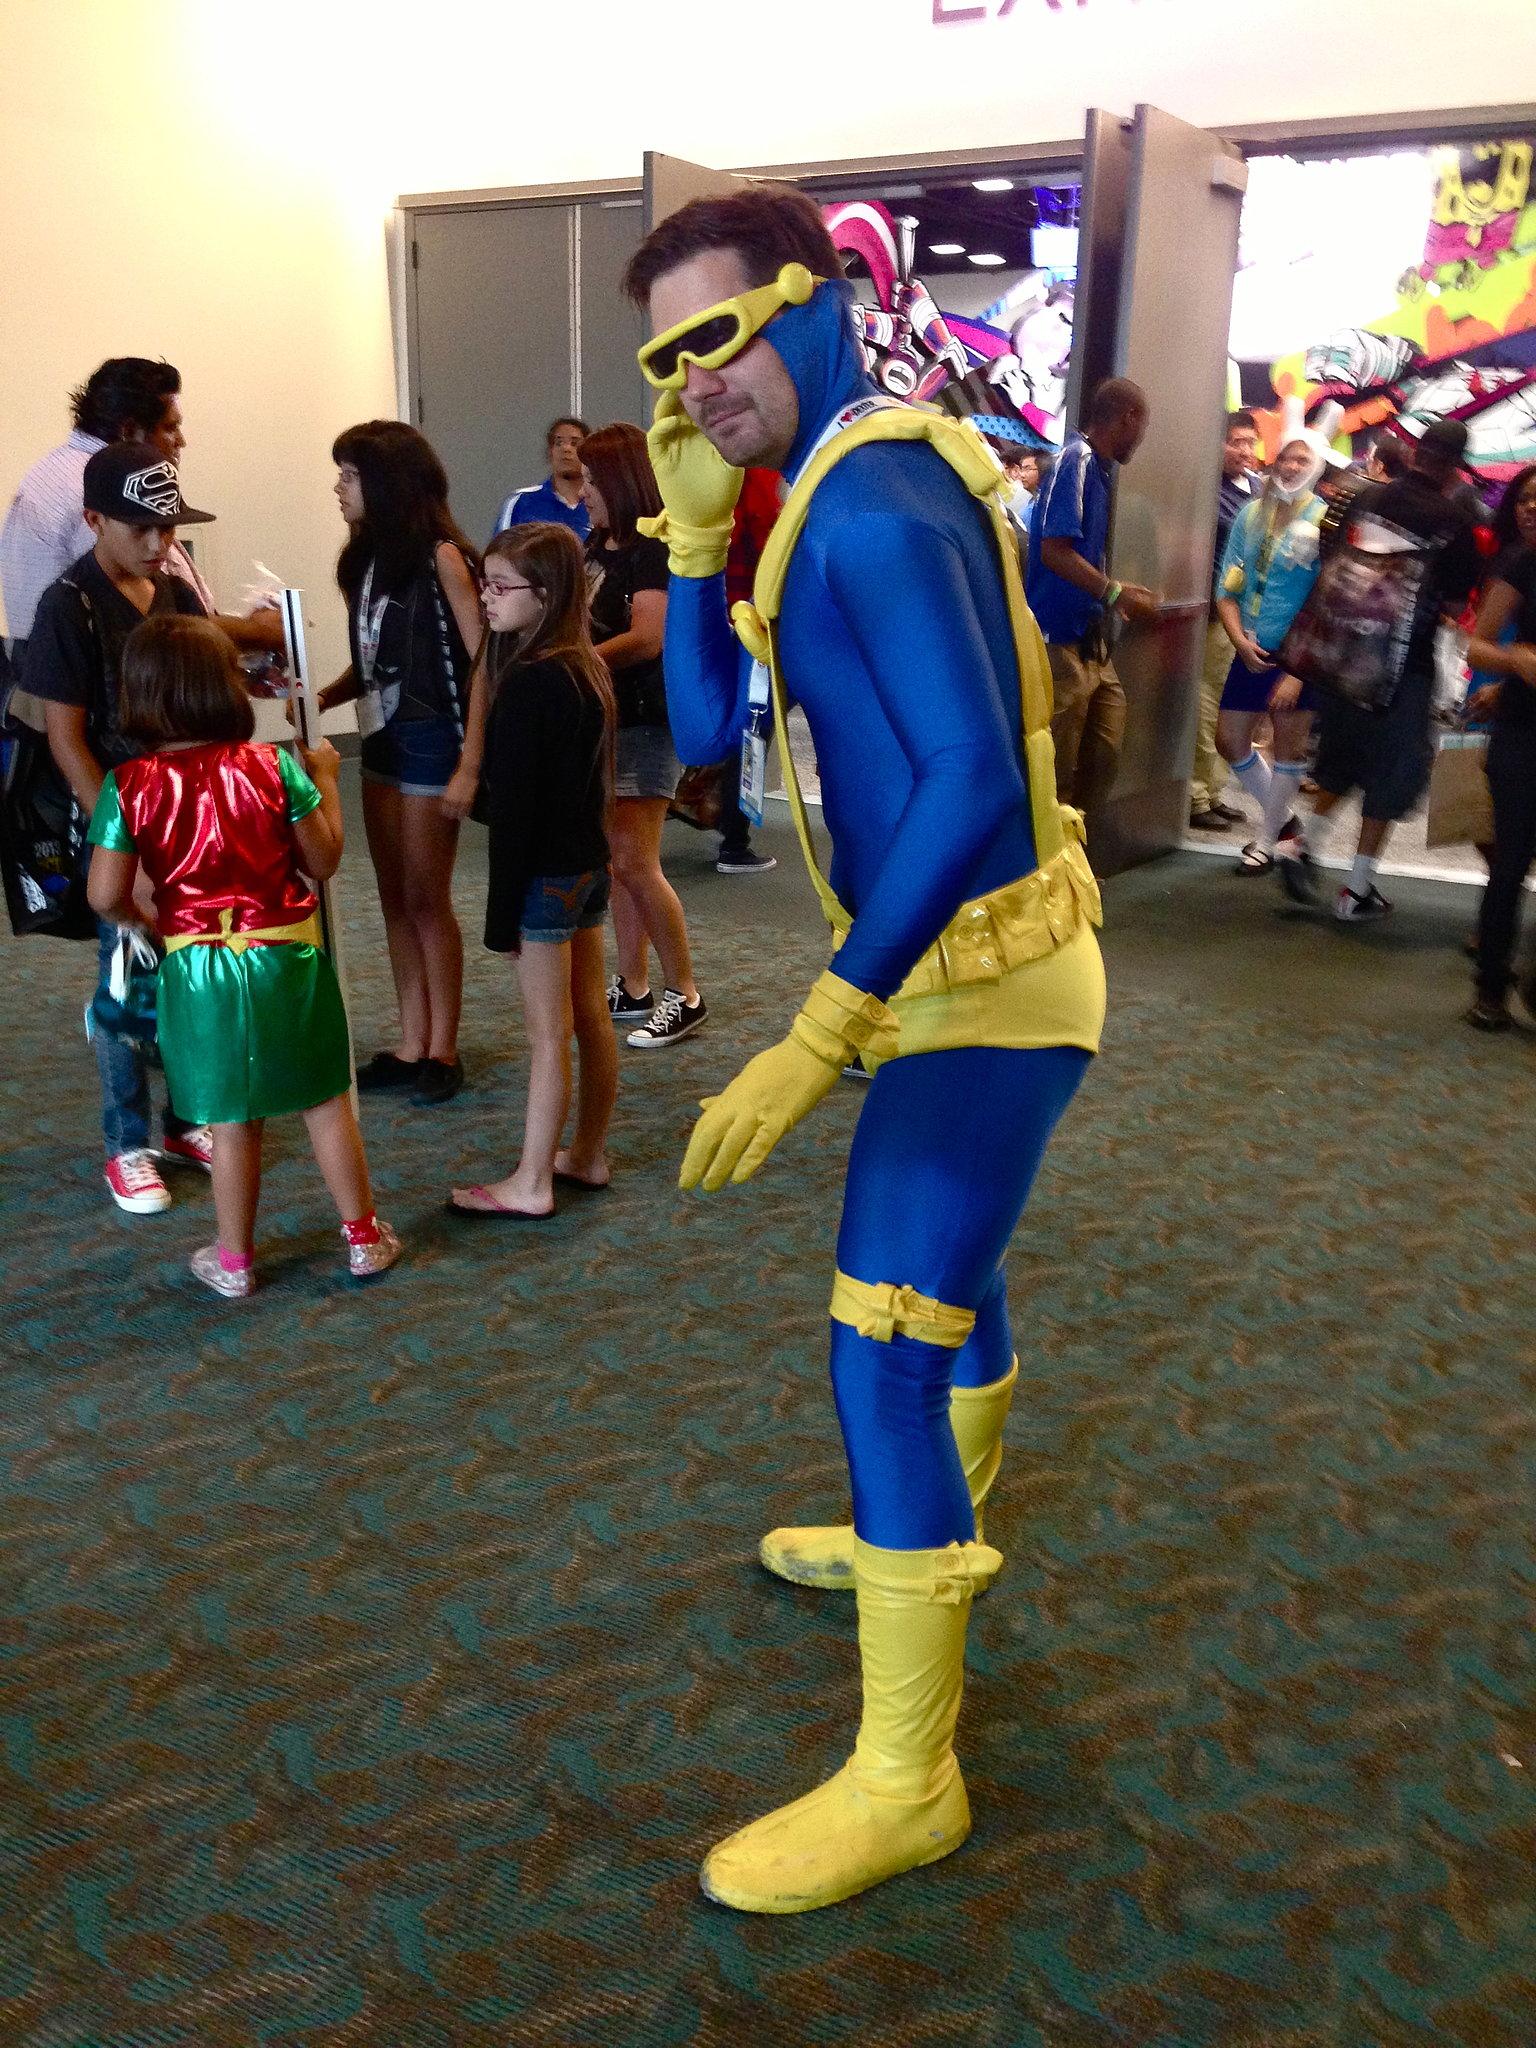 Cyclops prepares for his next move.